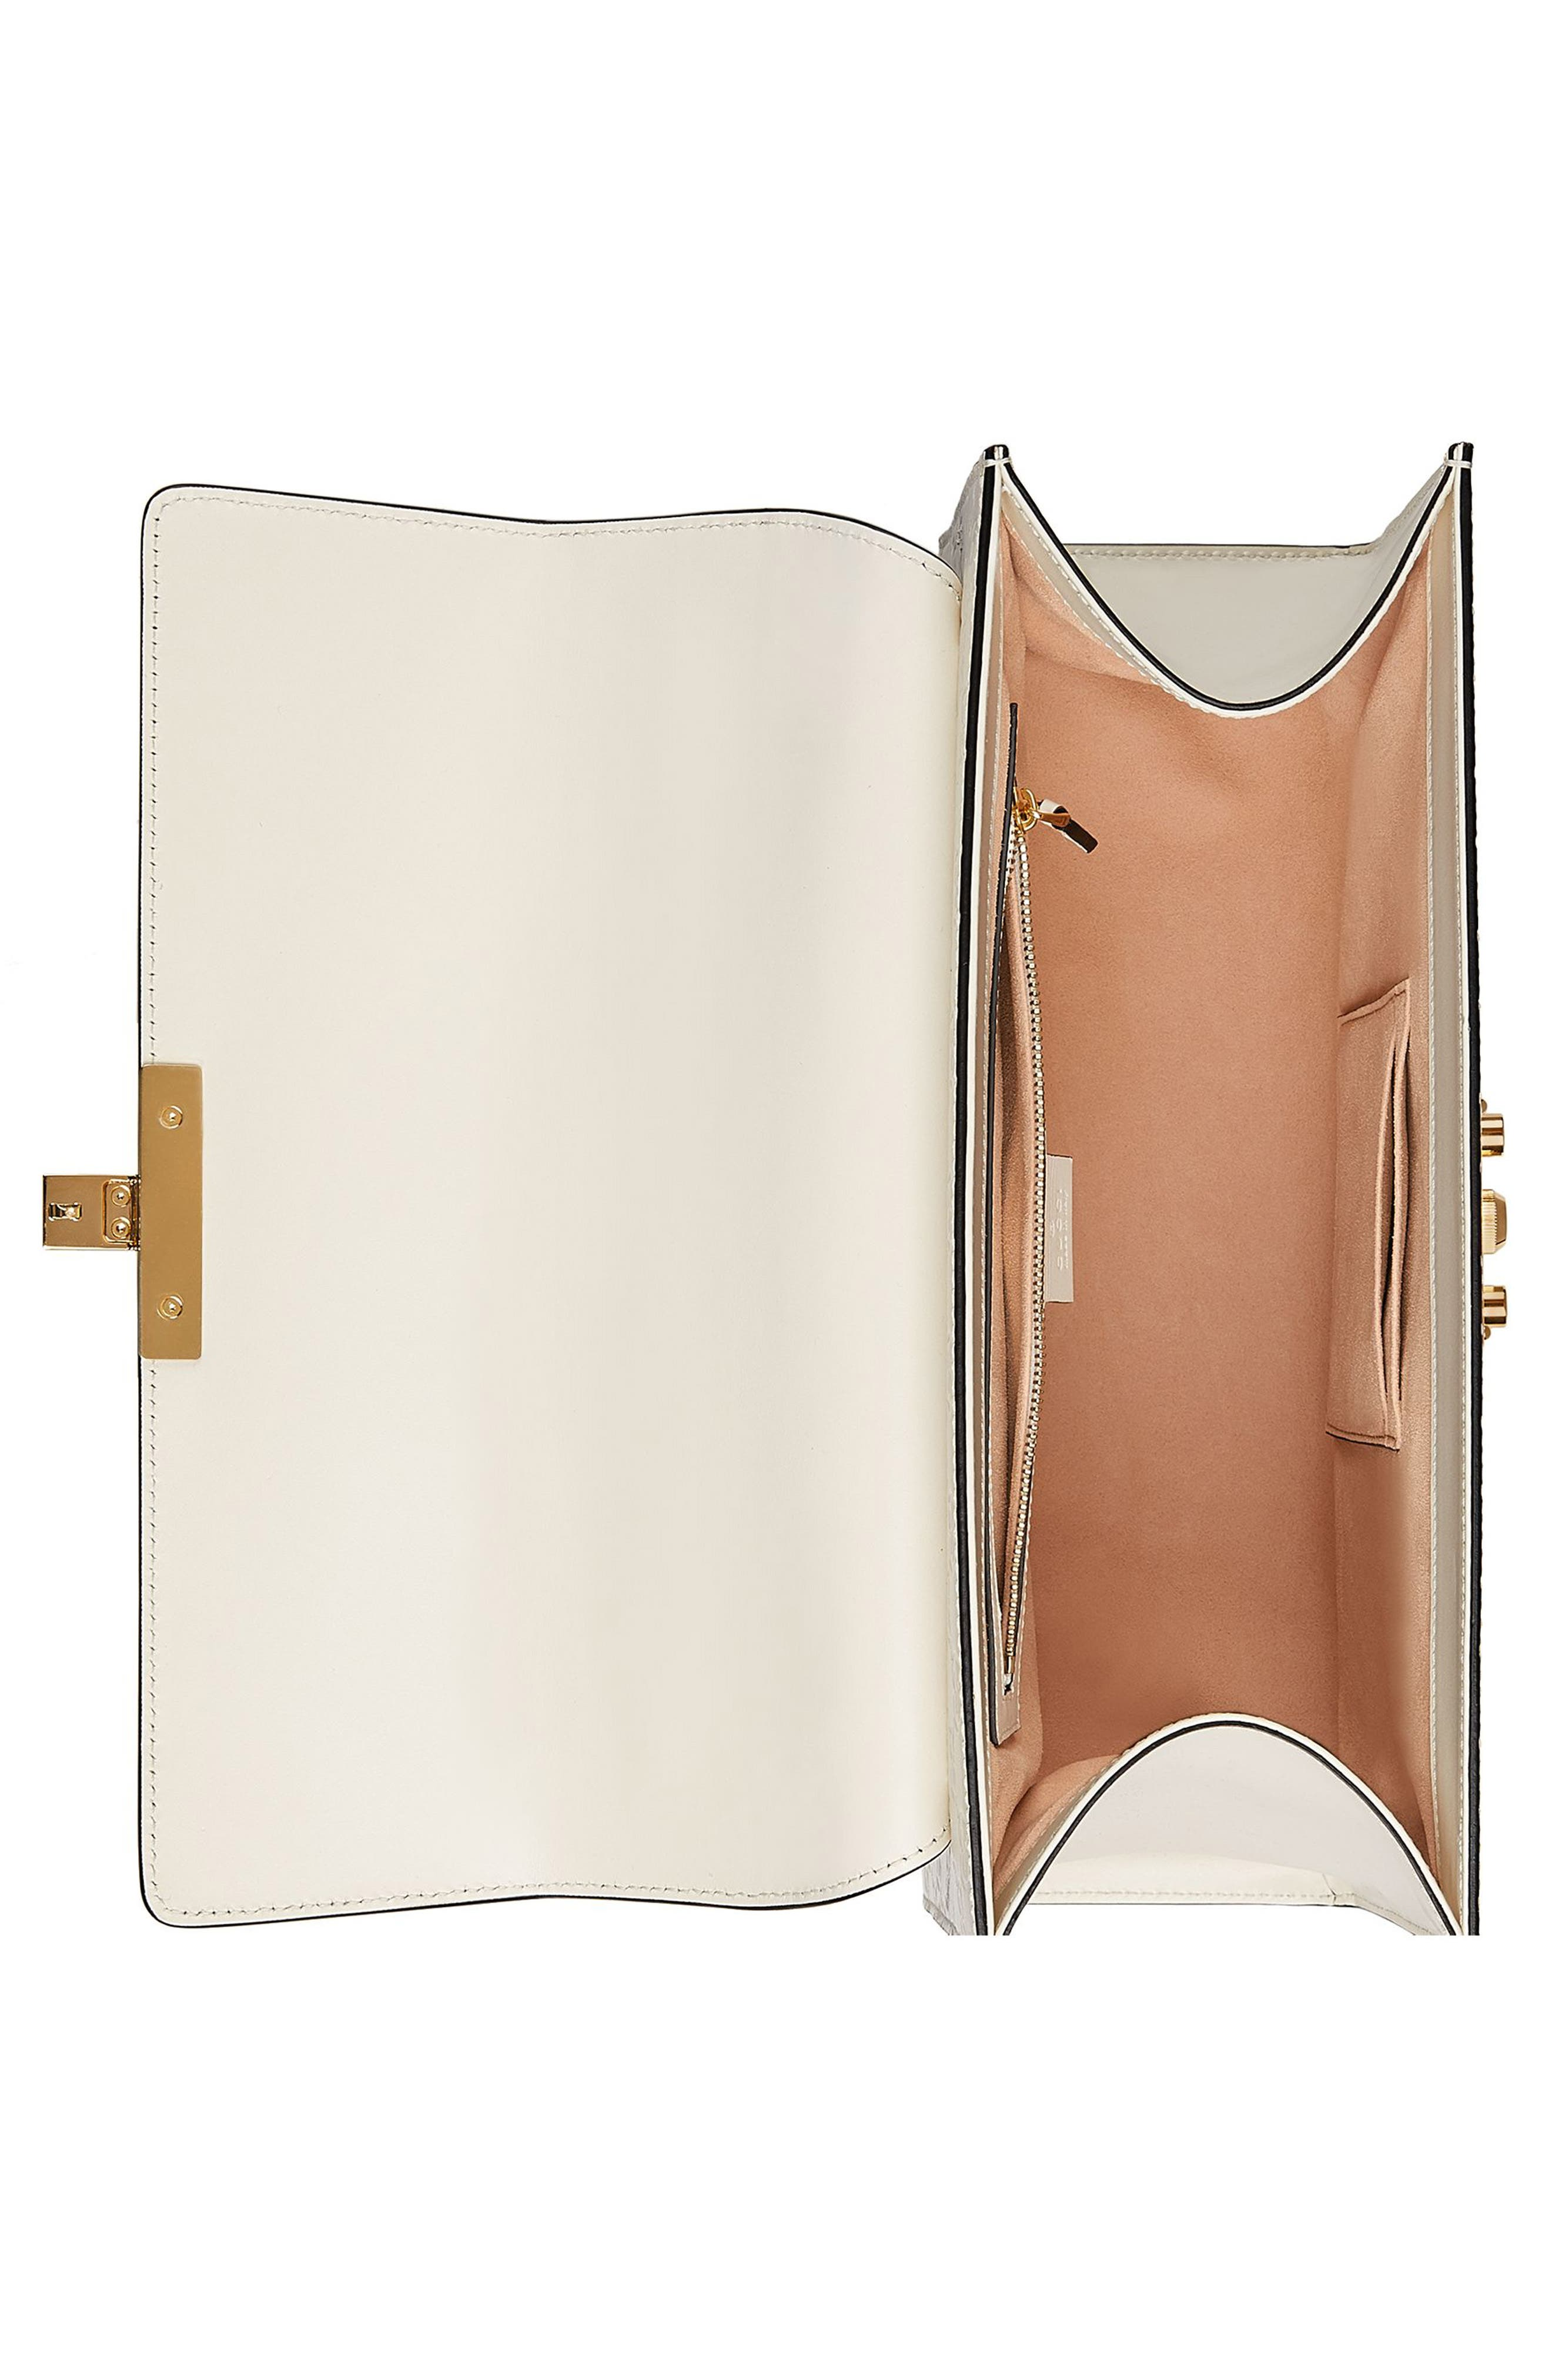 Alternate Image 3  - Gucci Medium Padlock Top Handles Signature Leather Satchel